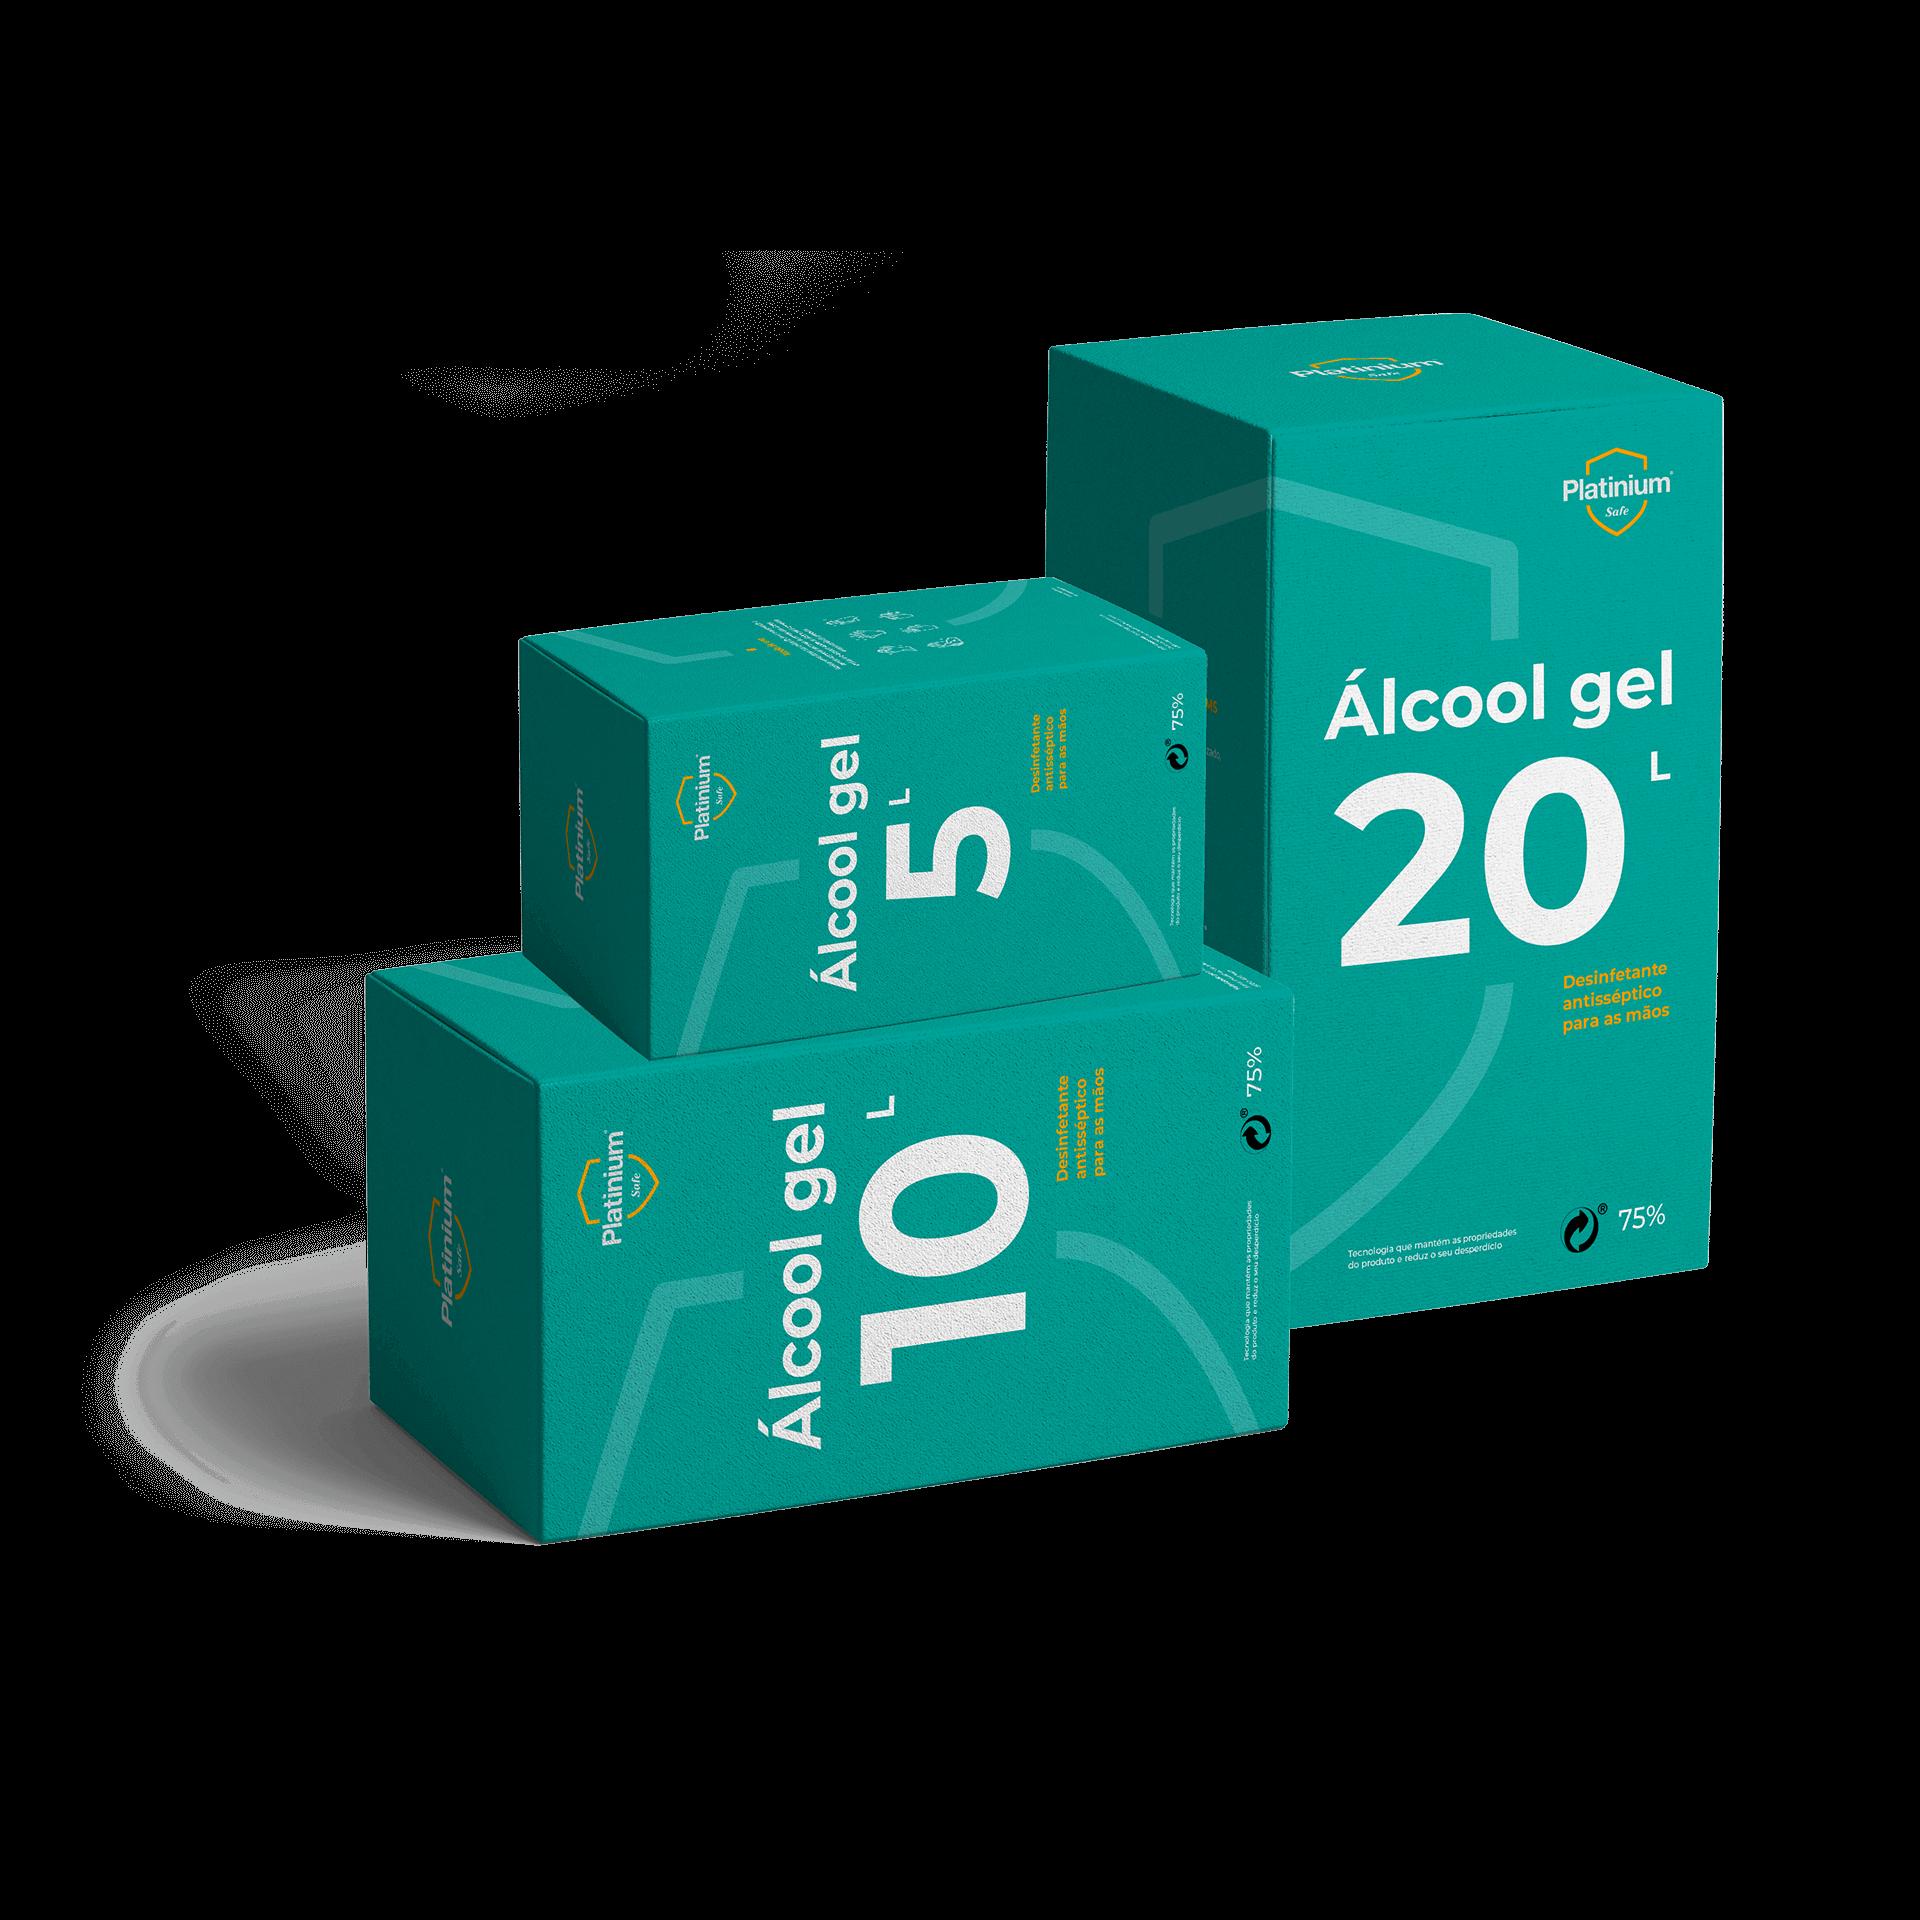 box-sizes_ 1_mobile